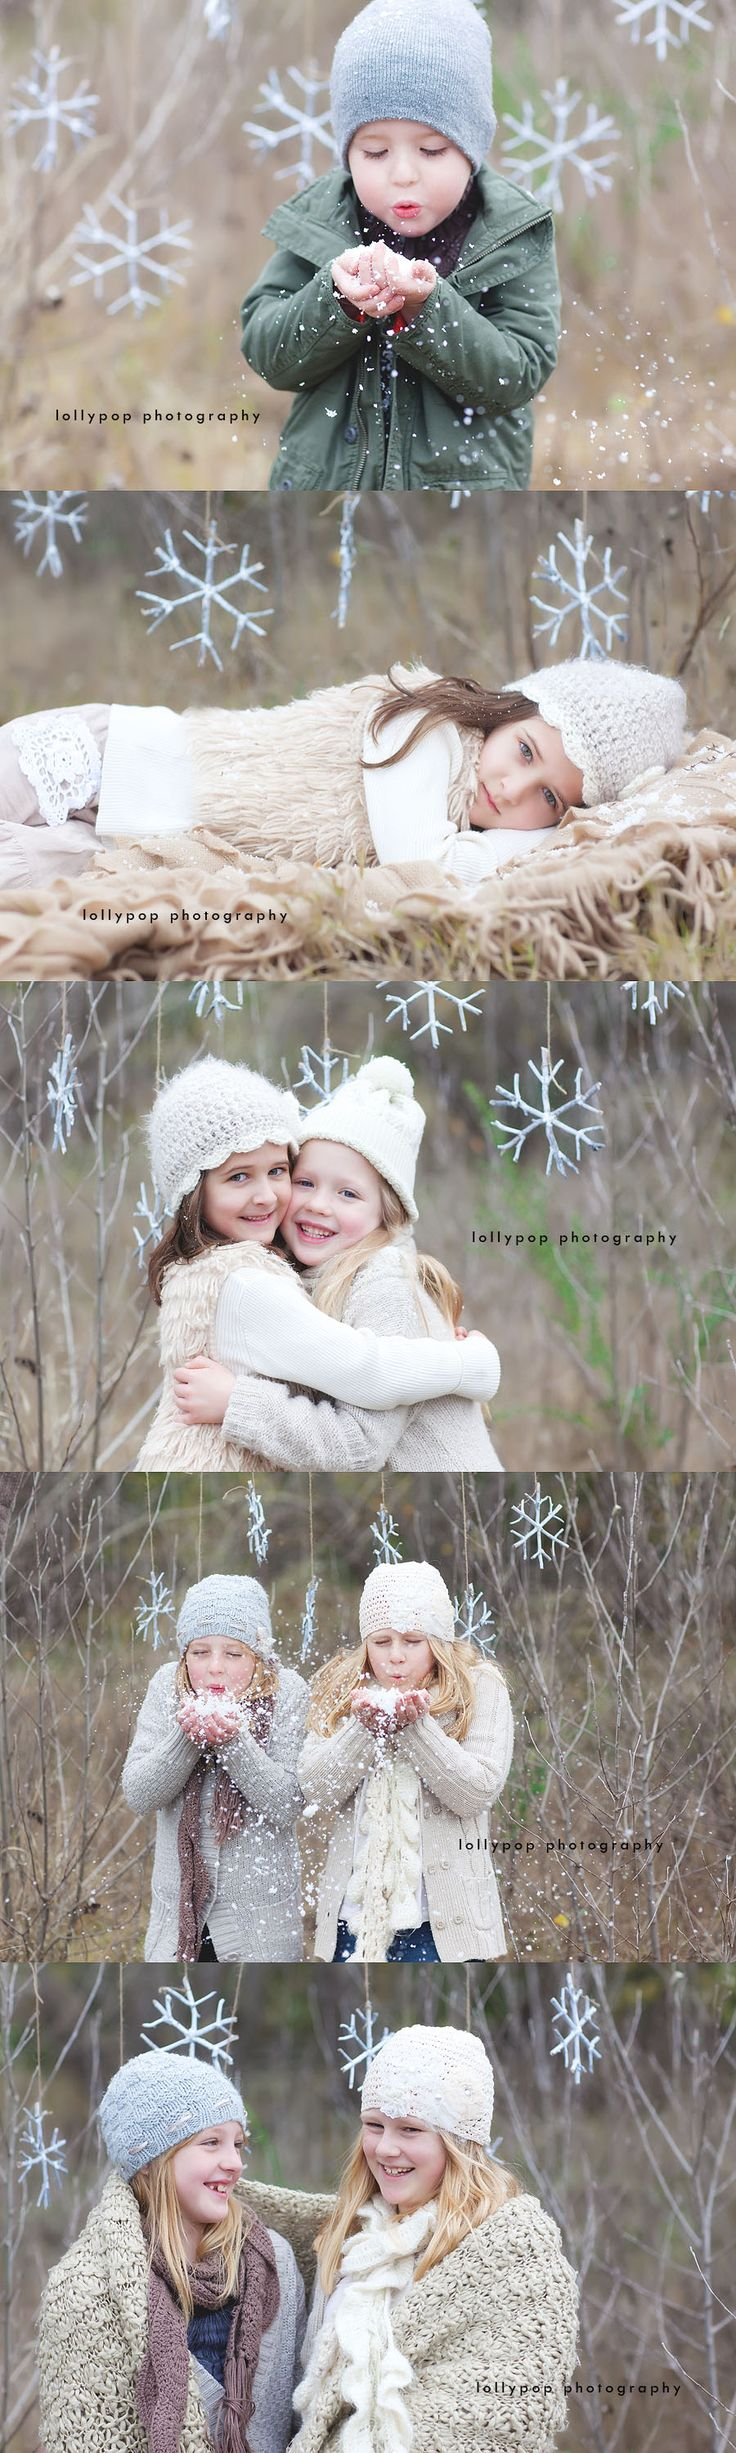 Bendigo kids photographer Such a cute idea for when there's no actual snow.